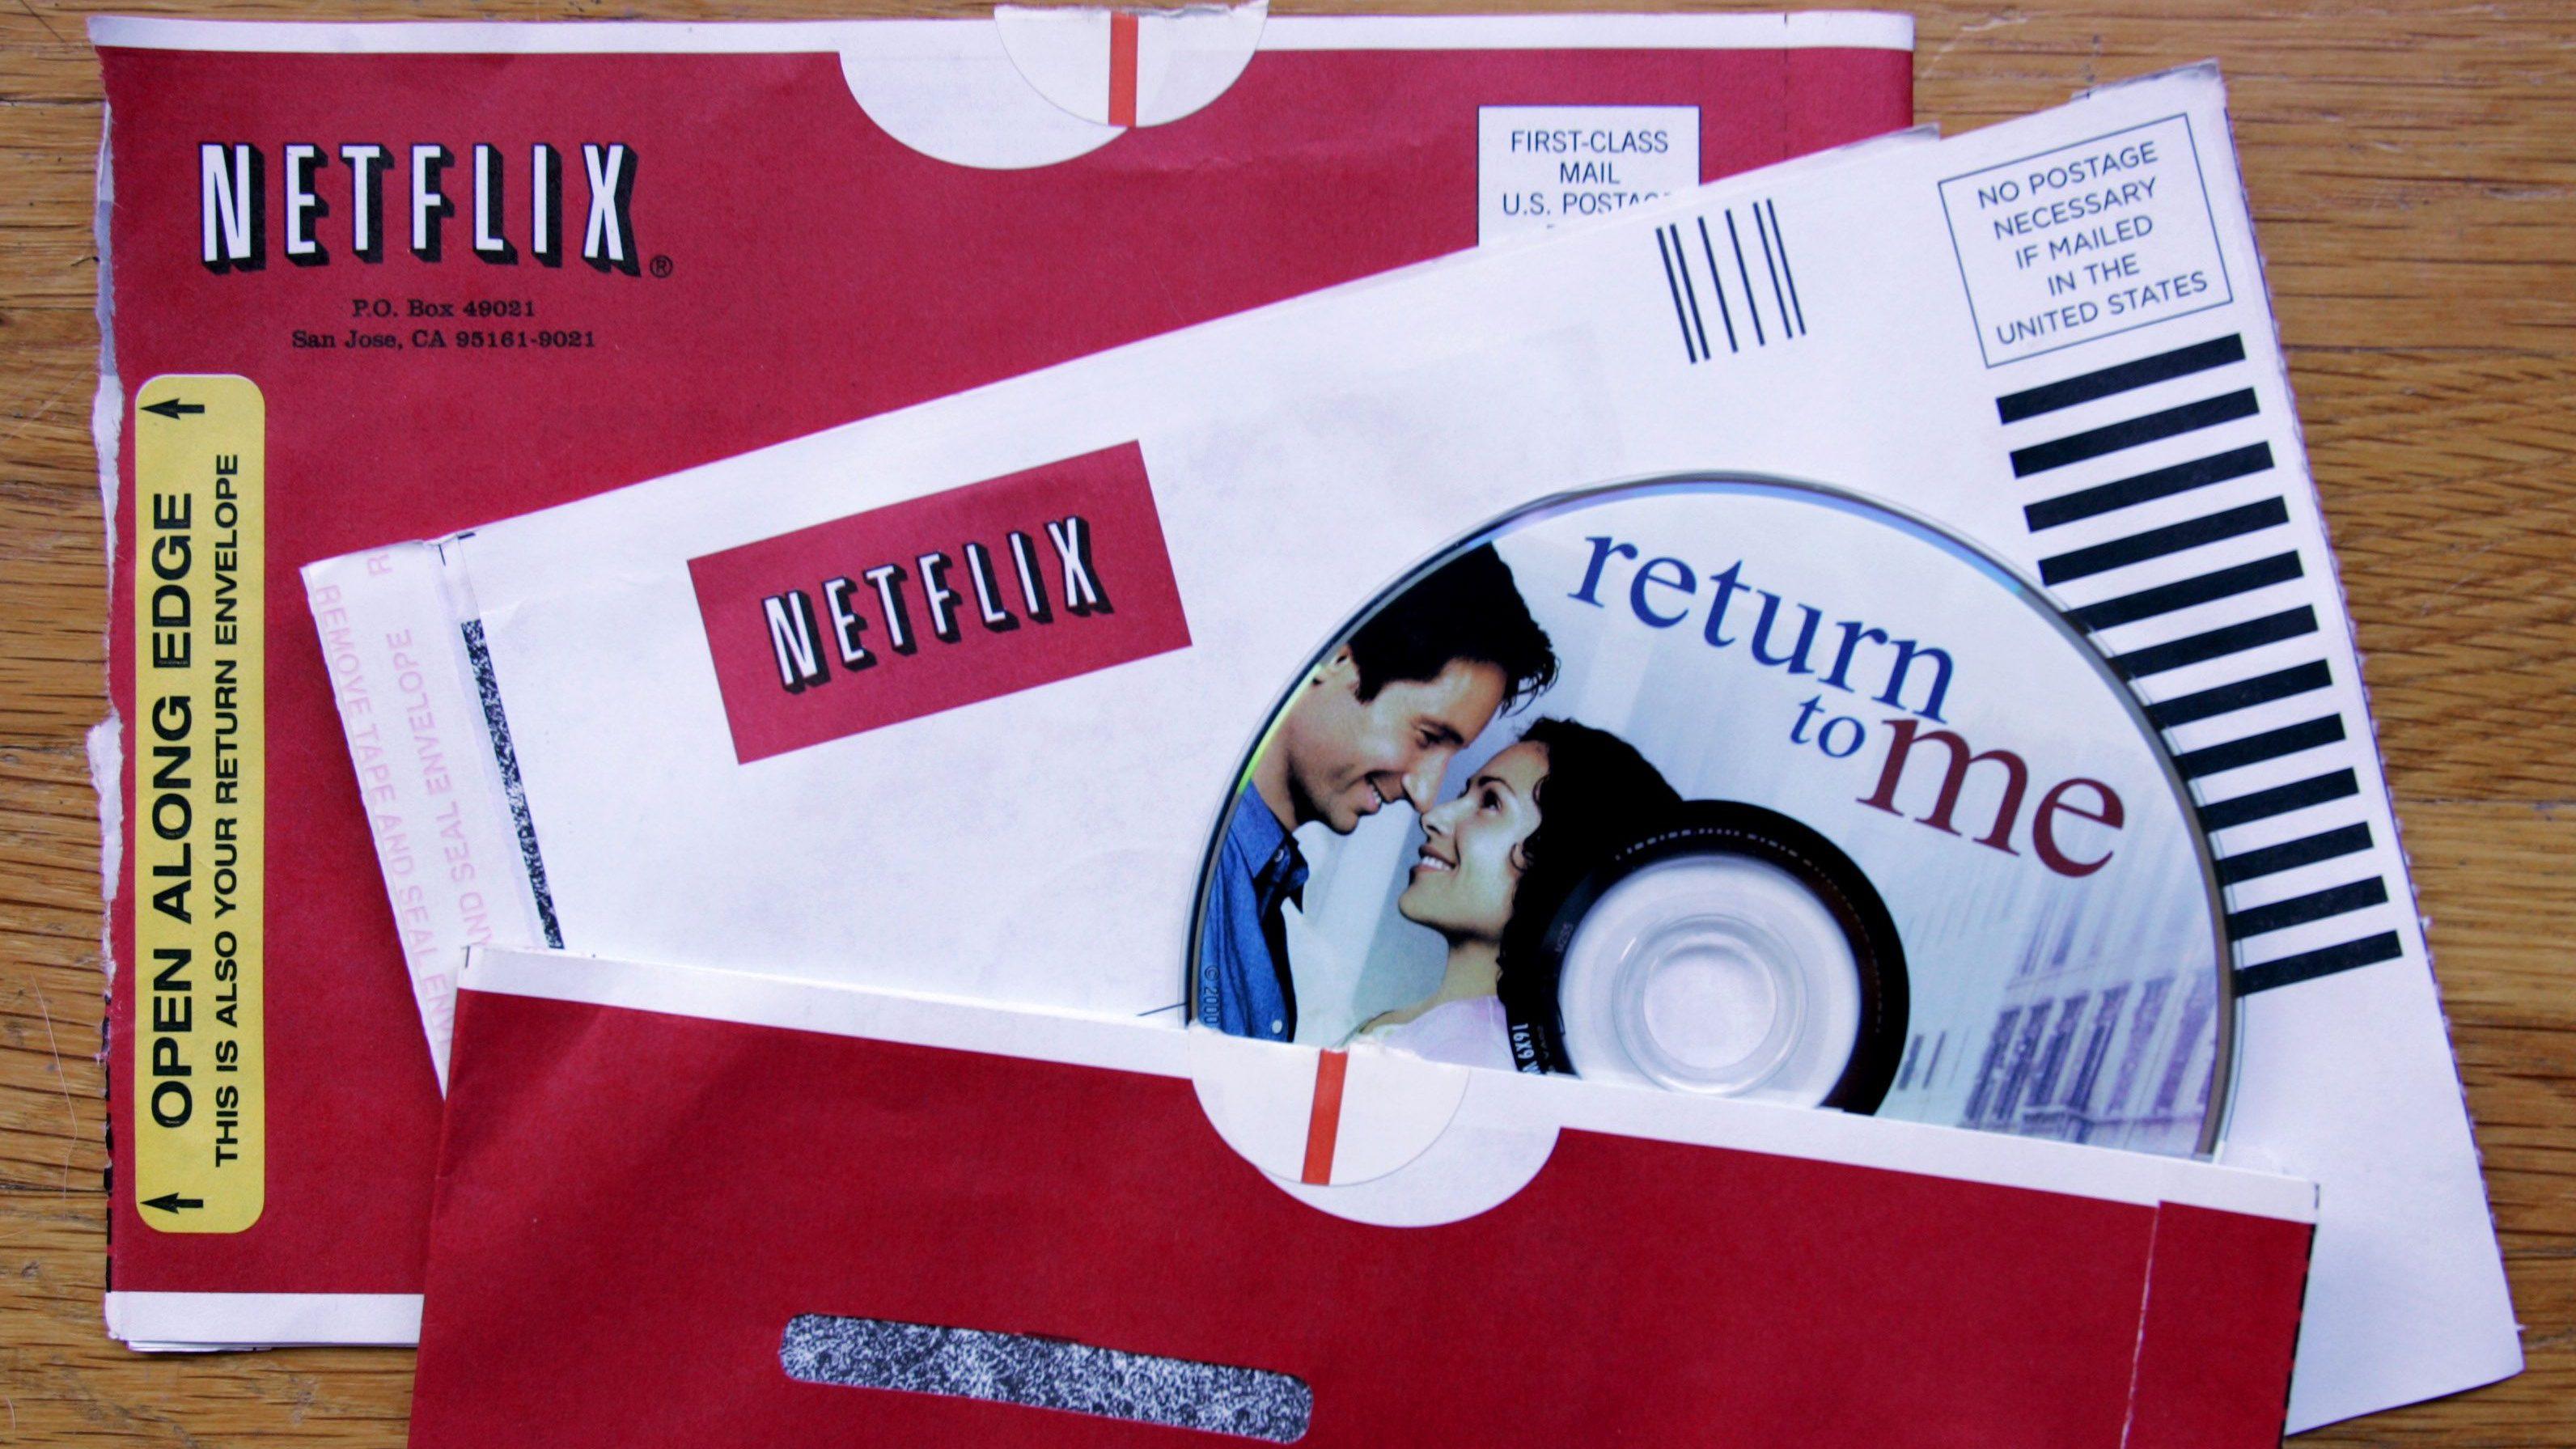 "Netflix envelopes and the DVD movie ""Return to Me"" is displayed at Netflix customer Coleman Garrett's home in Palo Alto, Calif., Friday, July 22, 2005. (AP Photo/Paul Sakuma)"